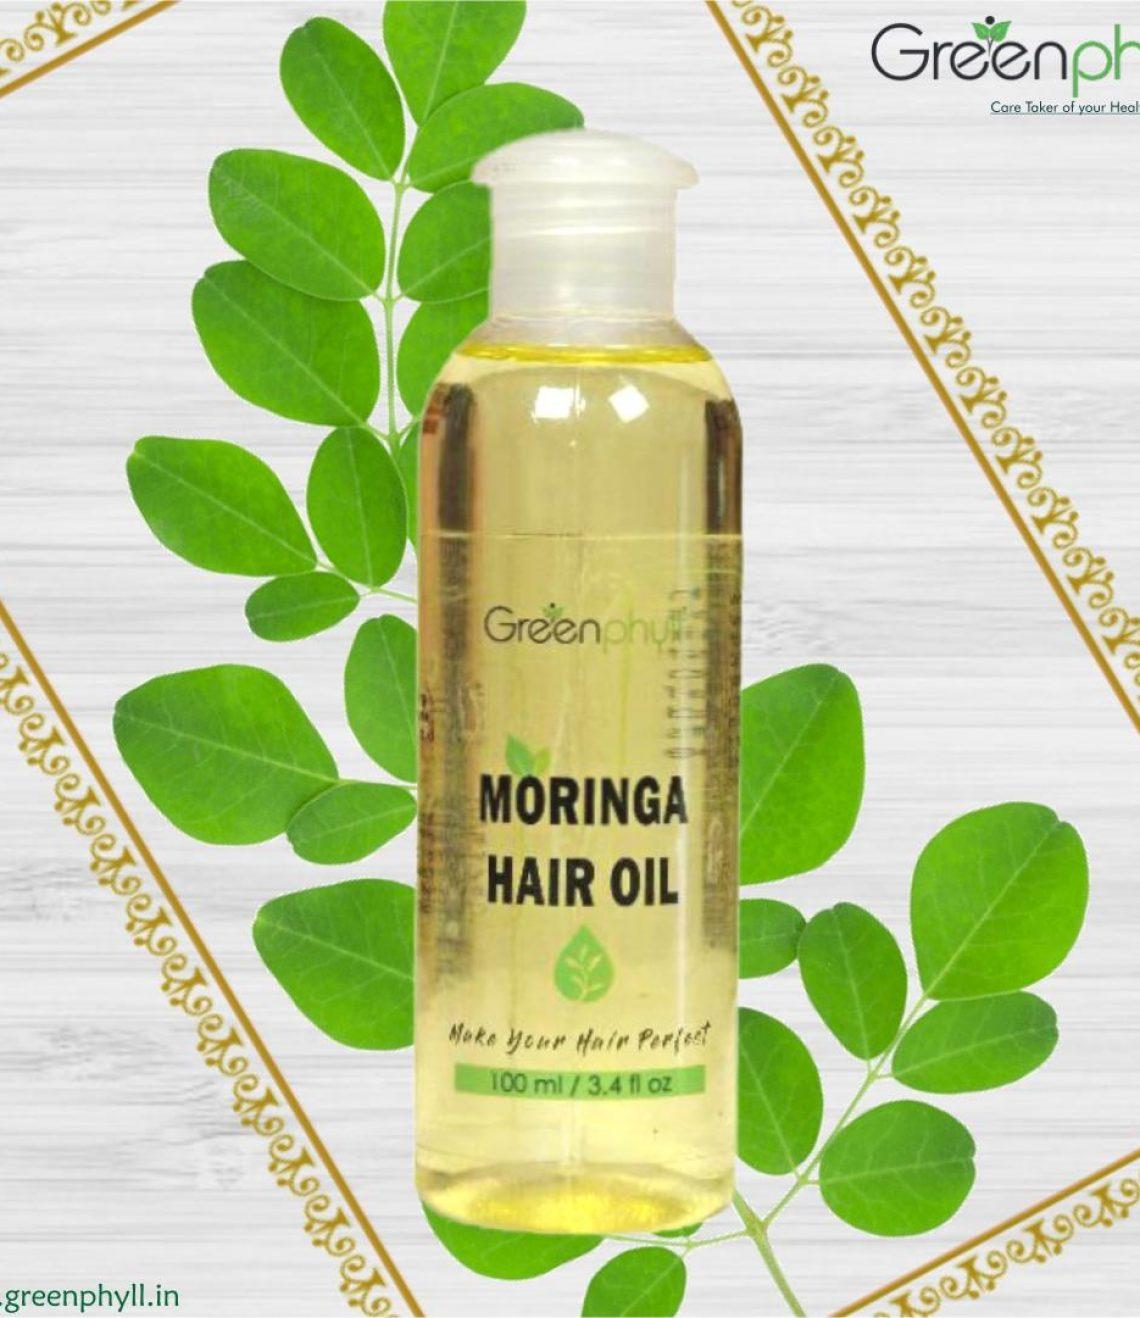 Greenphyll hair oil